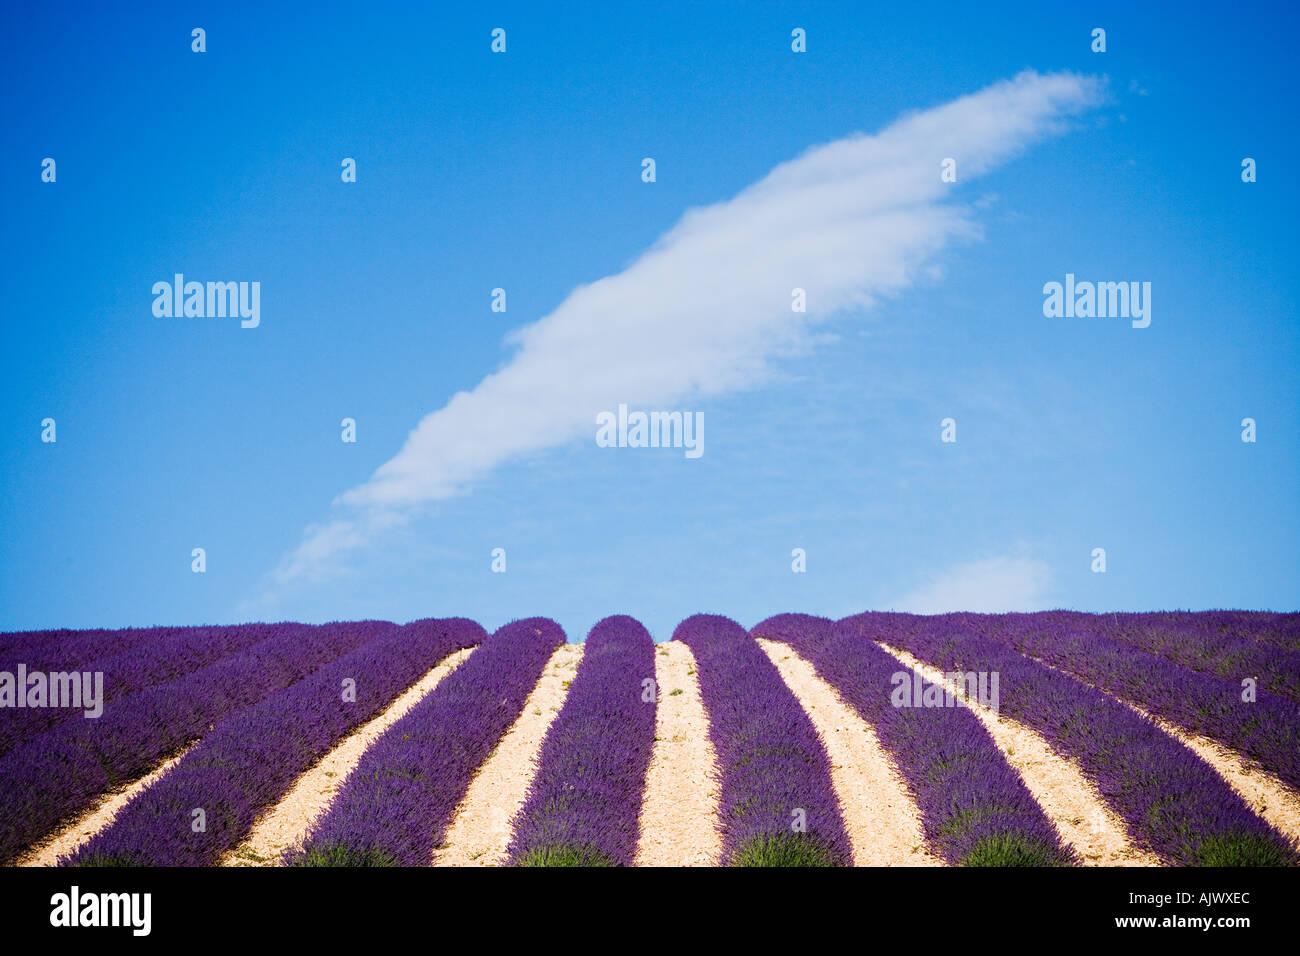 France Provence Valensole region Lavender field - Stock Image